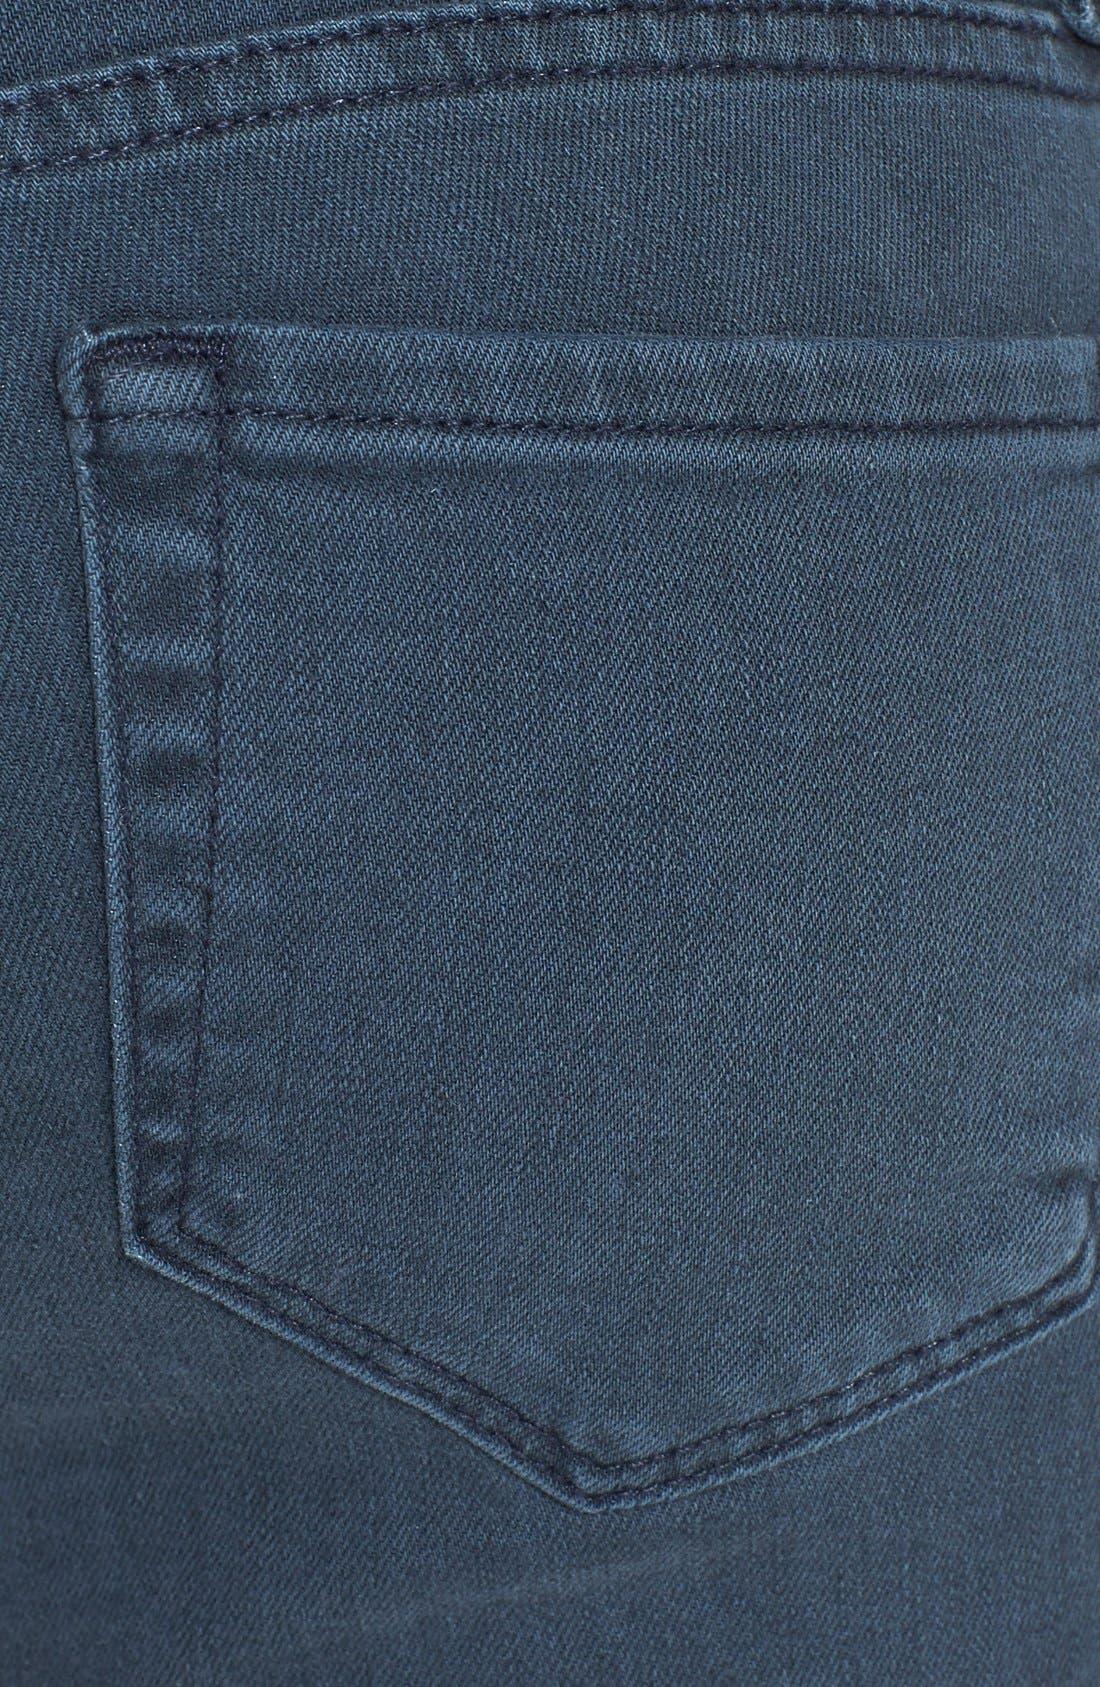 Low Rise Skinny Jeans,                             Alternate thumbnail 7, color,